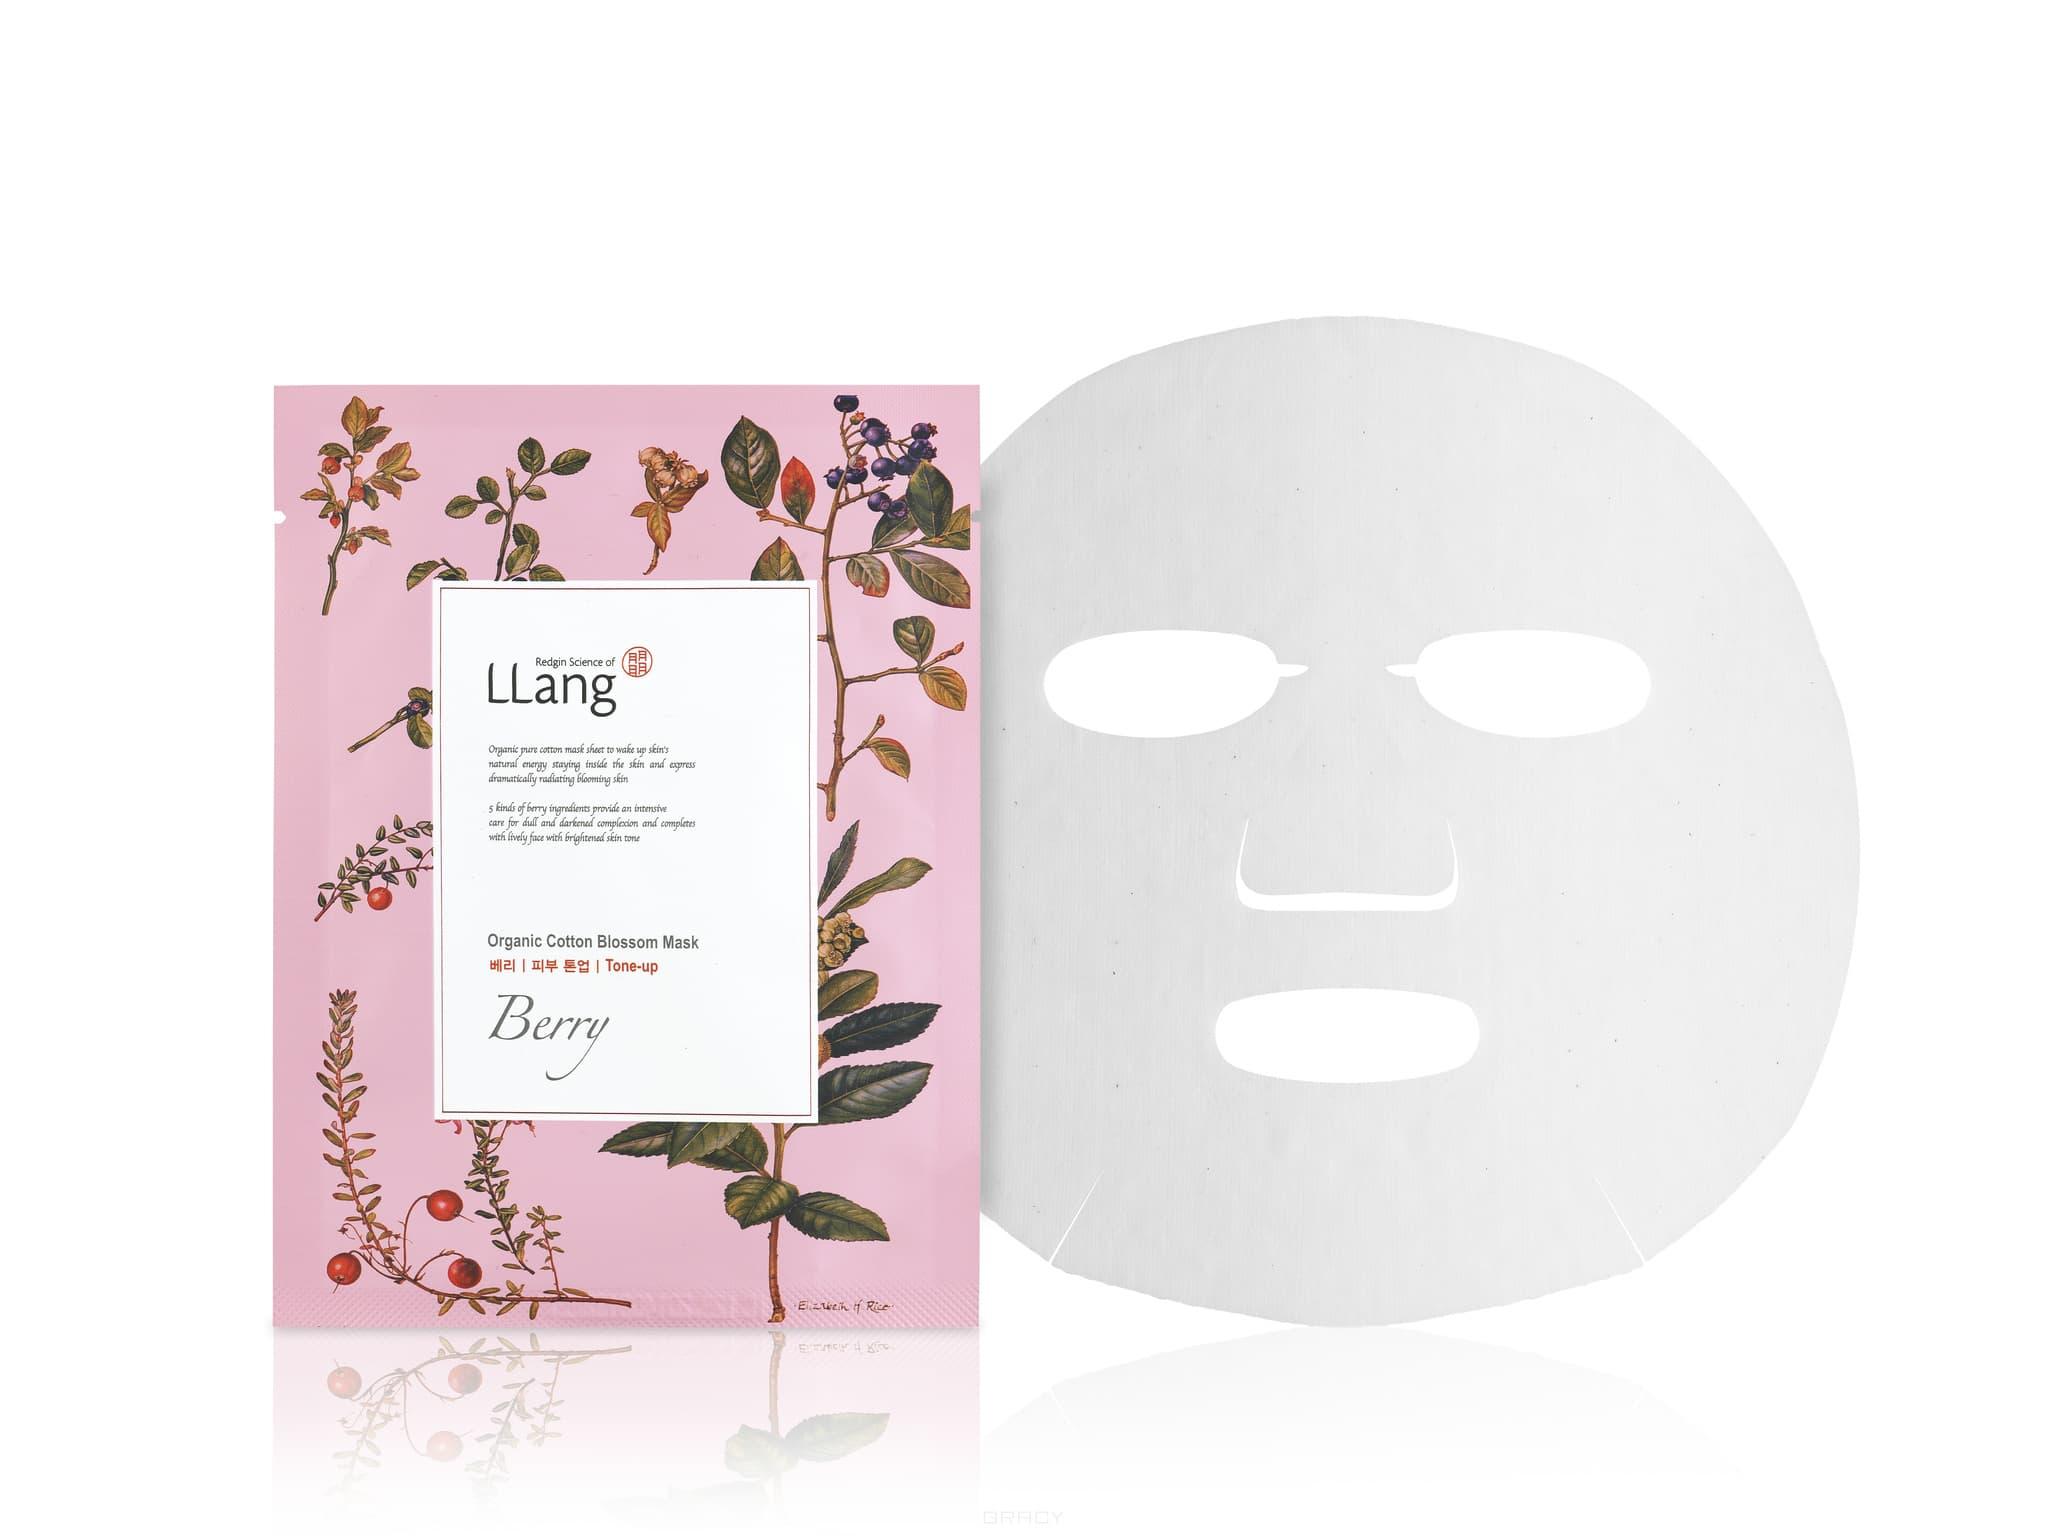 LLang, Тканевая маска с экстрактом ягод Organic Cotton Blossom Mask (Berry), 20 мл 3m 7501 6001 original respirator half face mask painted activated carbon organic vapor gas benzene cs2 acetone xk008